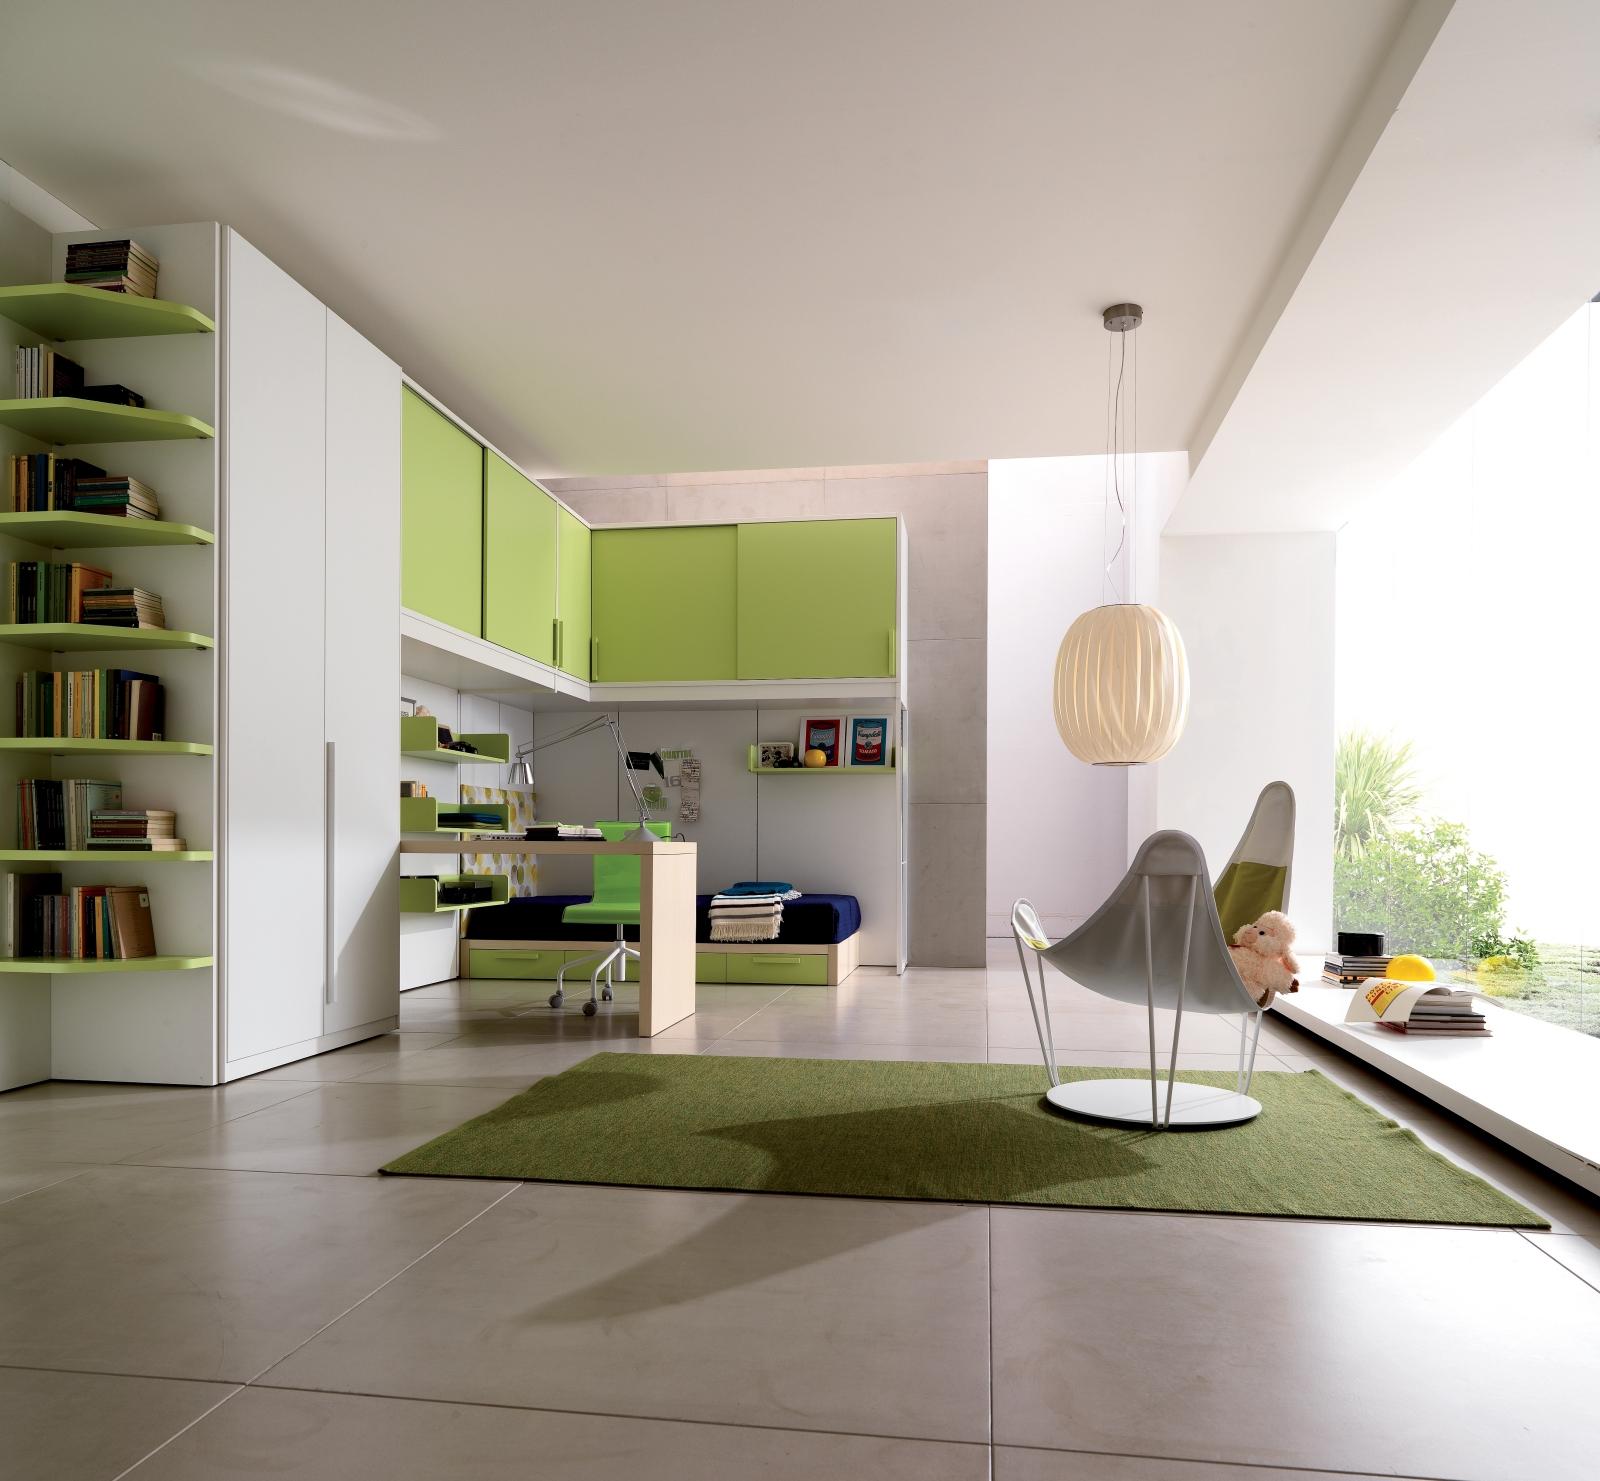 Twin Bedding Teen Room Designs From Zalf on Teenage Room Design  id=41474